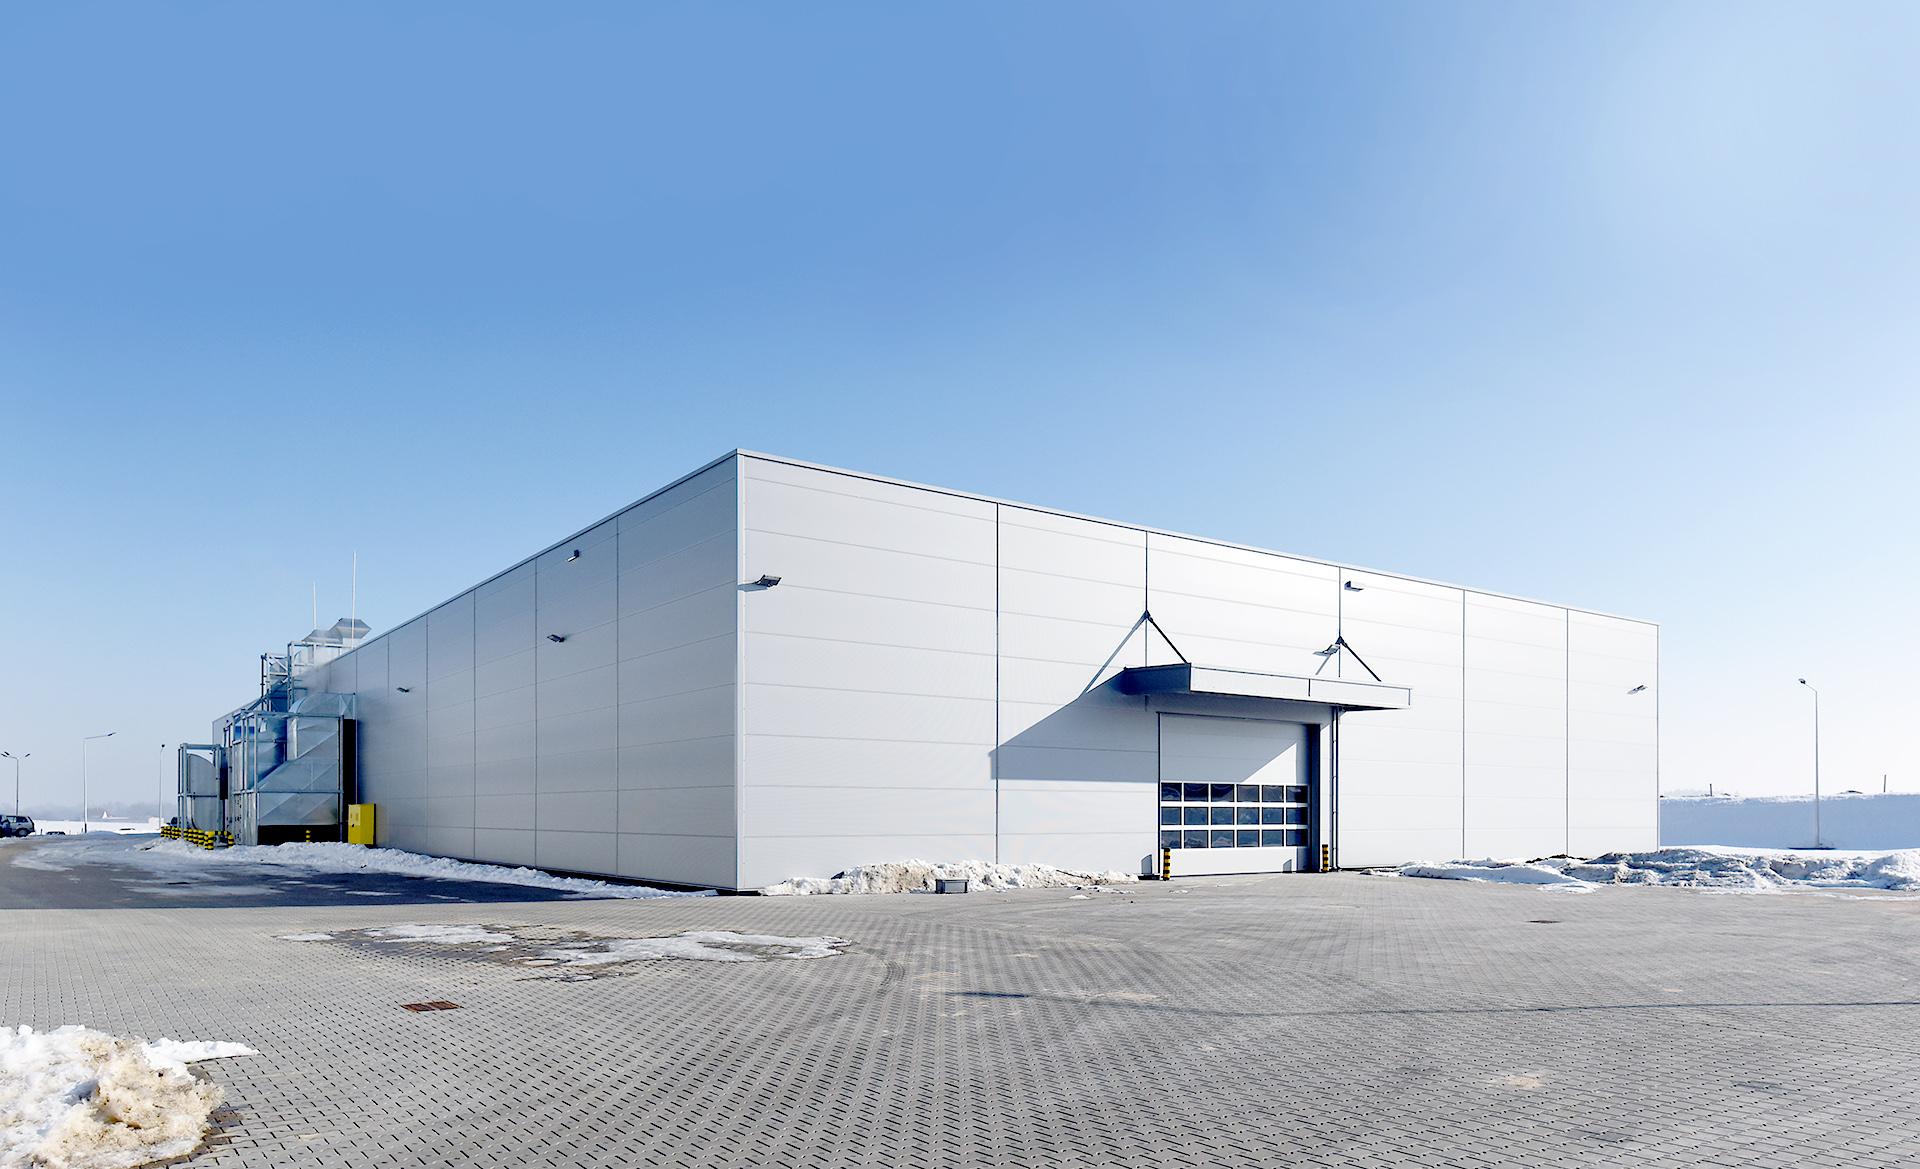 Novoferm factory in Wykroty Poland built by Takenaka Europe